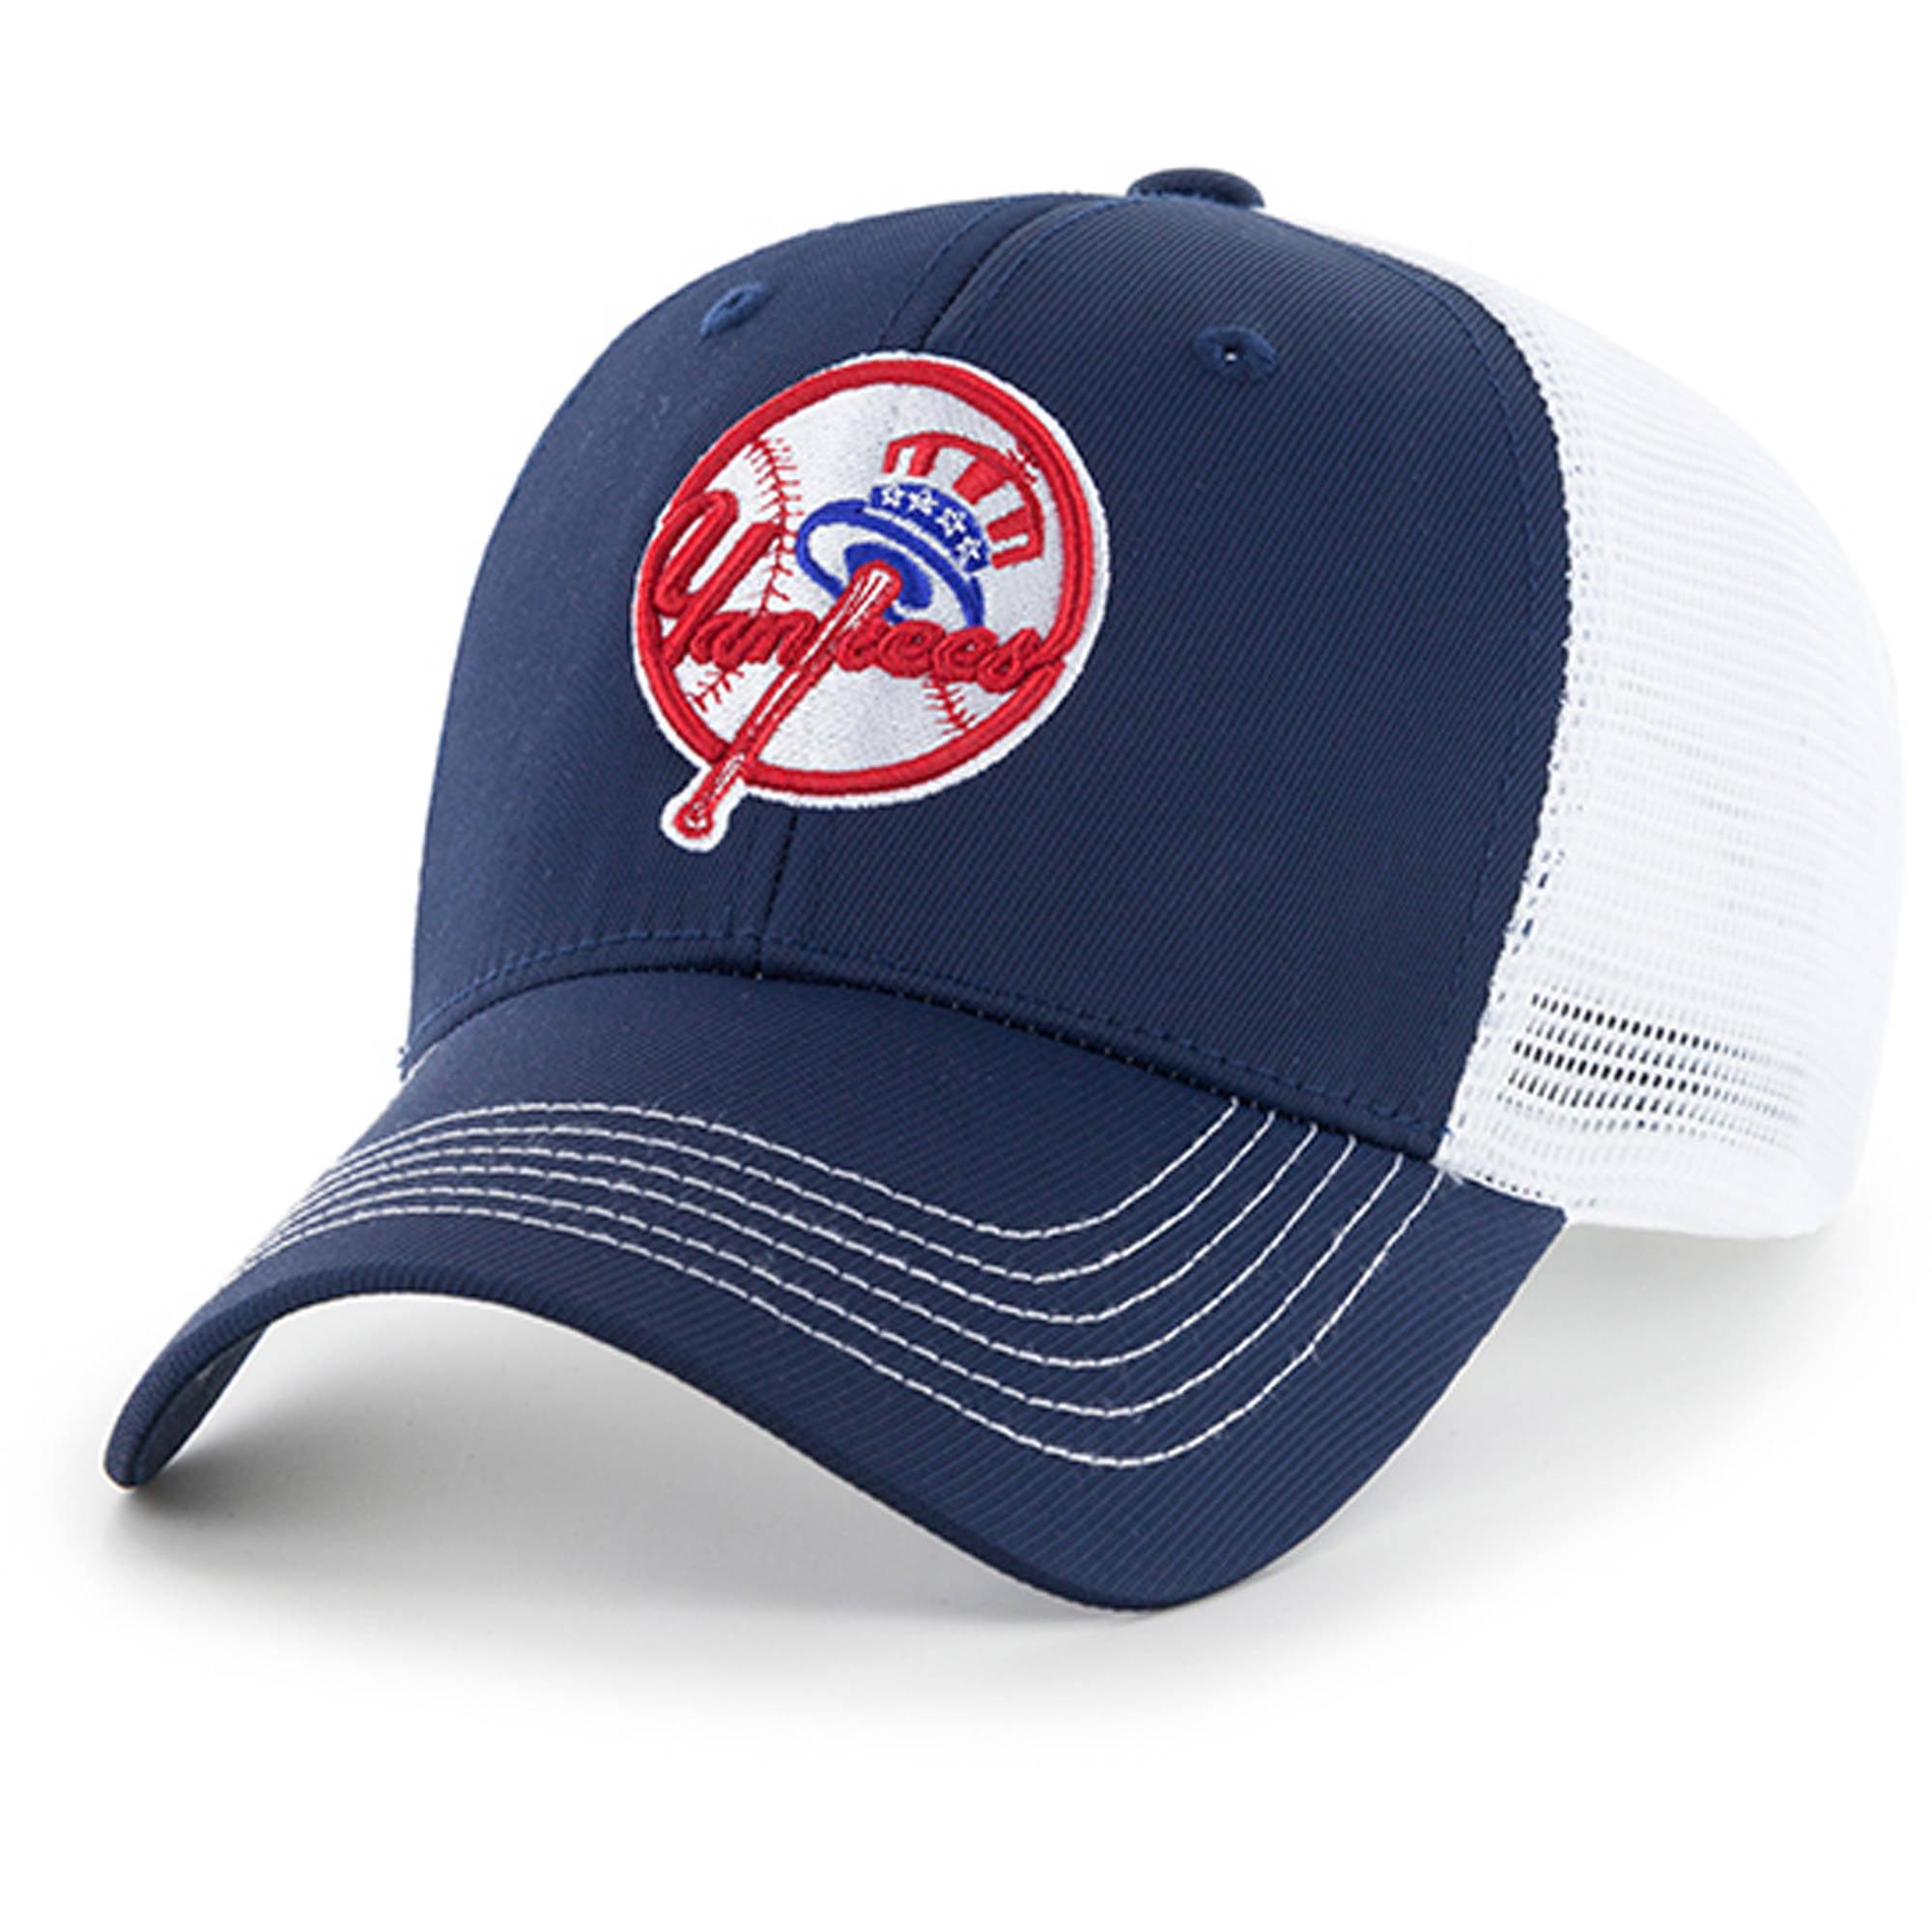 MLB New York Yankees Raycroft Cap / Hat by Fan Favorite